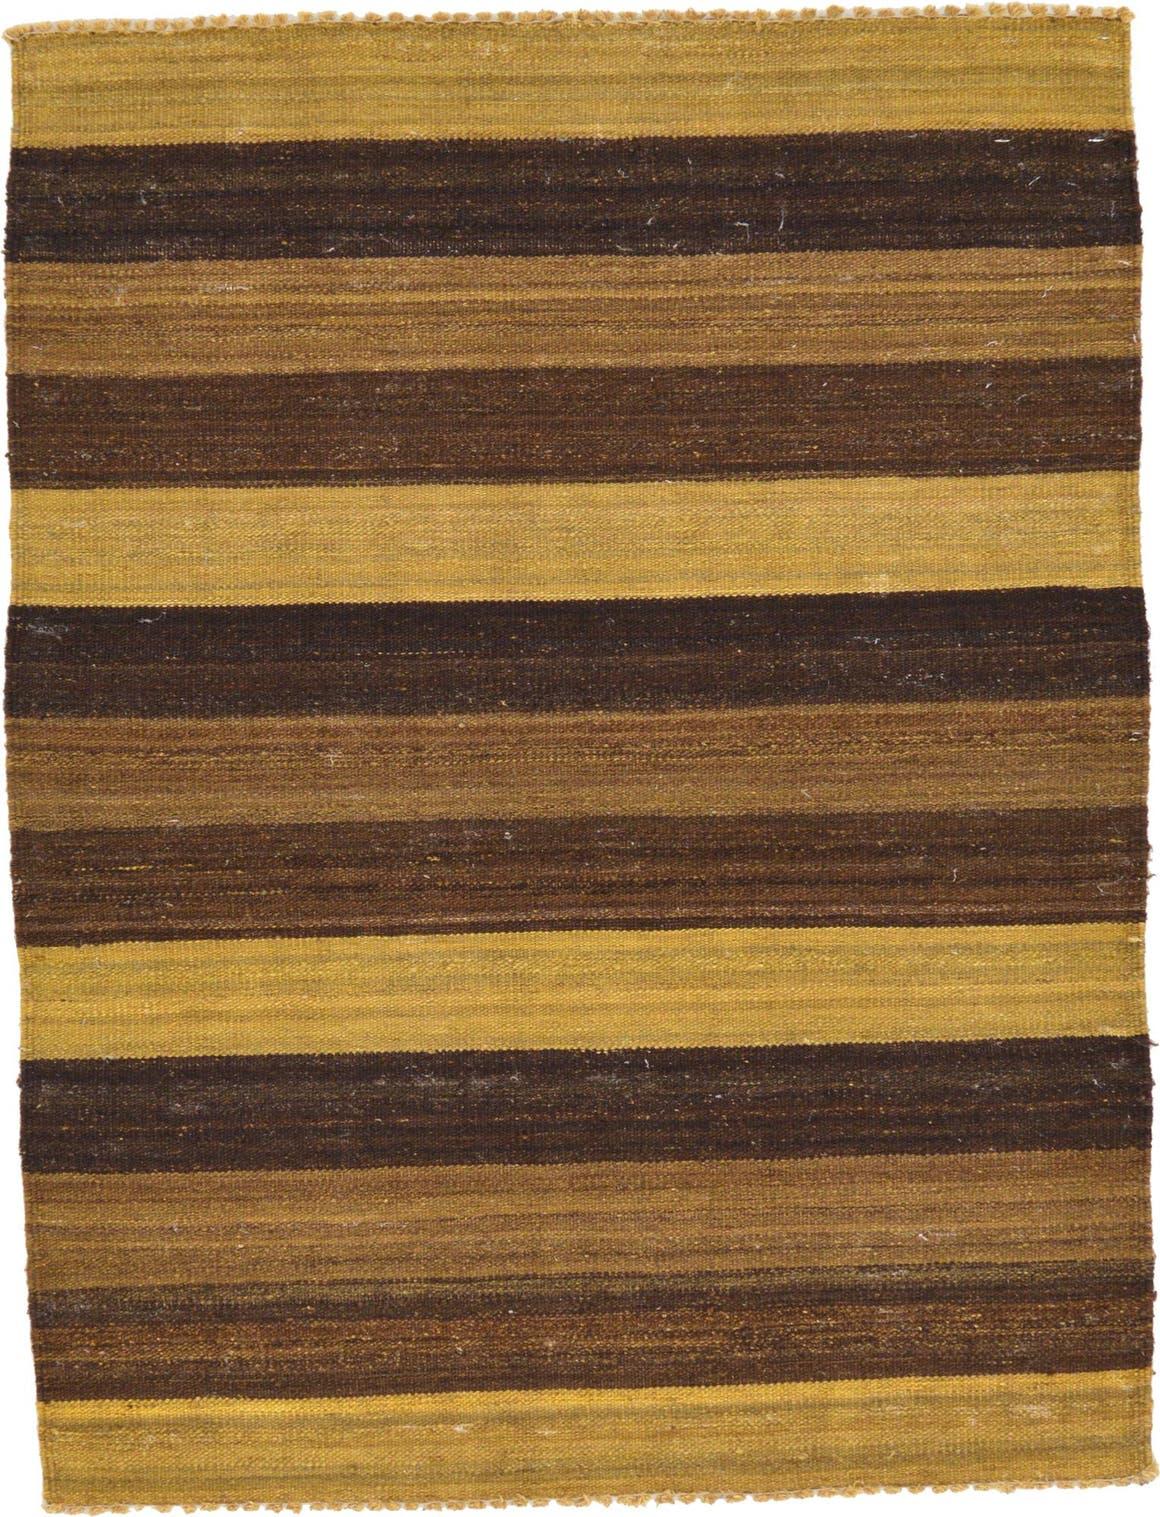 3' x 3' 11 Striped Modern Kilim Rug main image